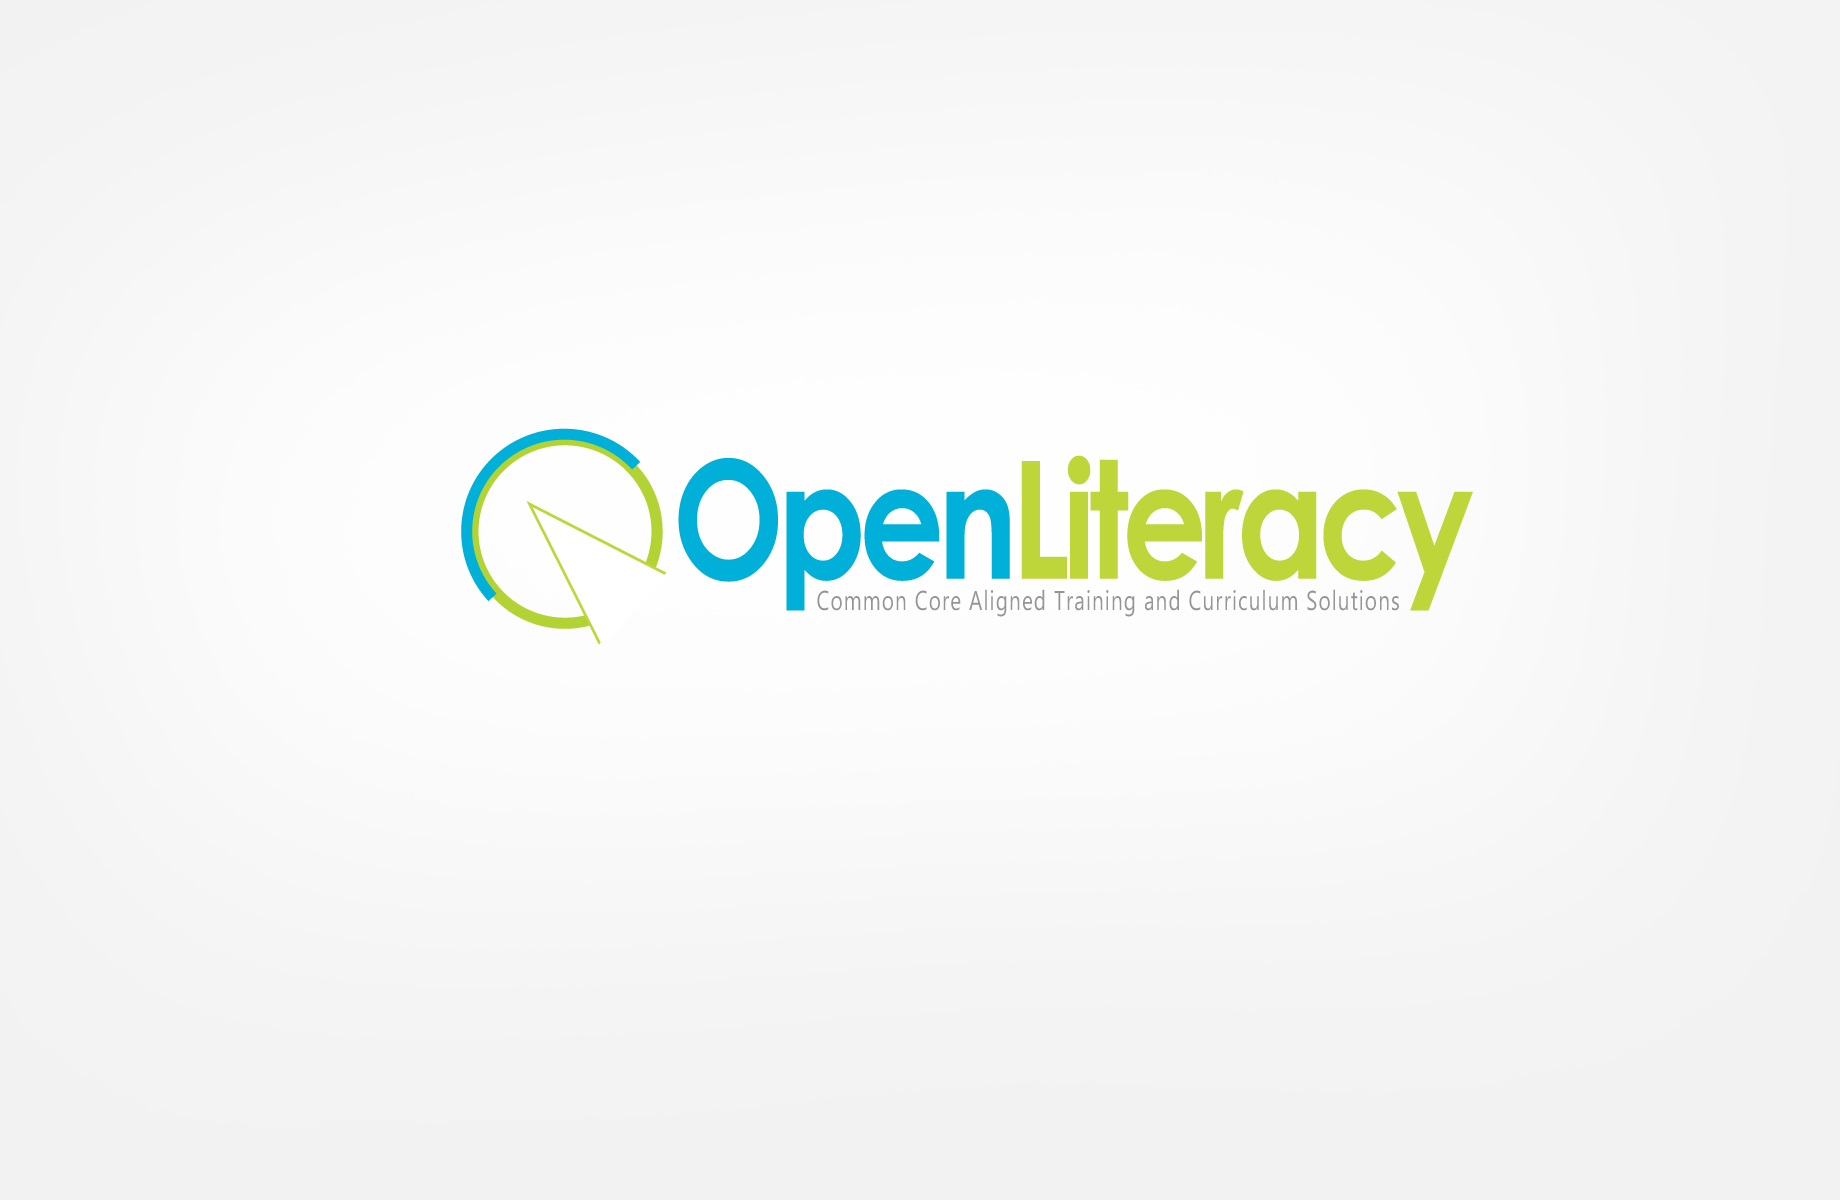 Logo Design by Jan Chua - Entry No. 31 in the Logo Design Contest Inspiring Logo Design for OpenLiteracy.